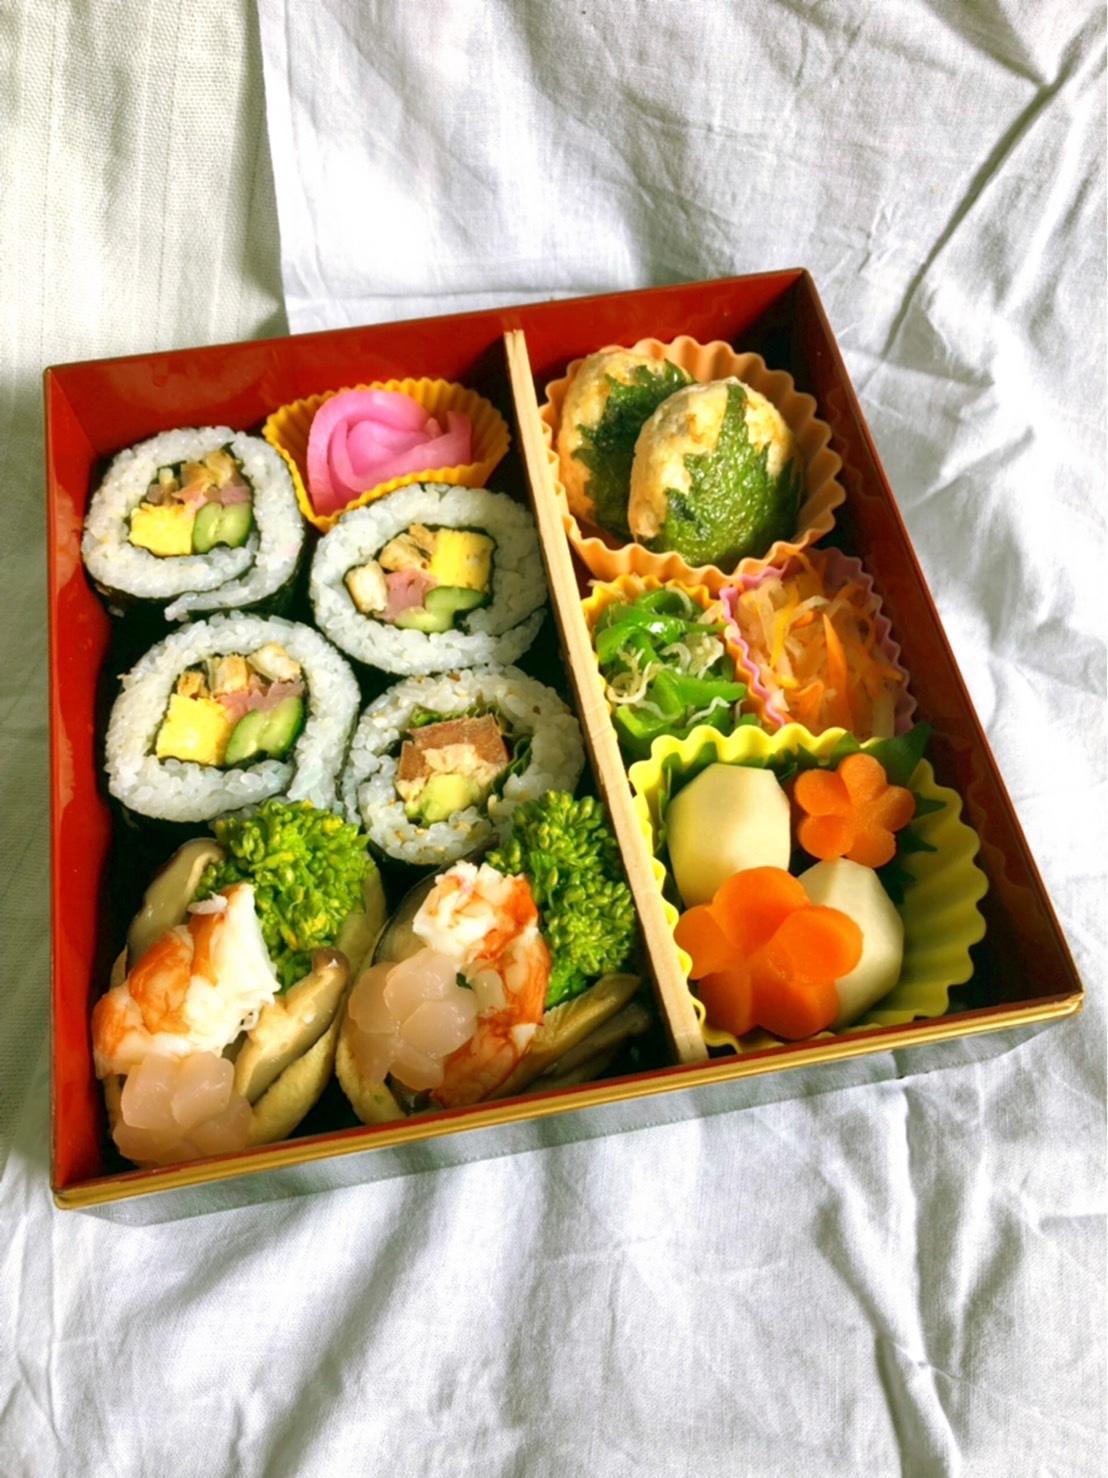 Saturday Lunch box_b0376788_15362640.jpg